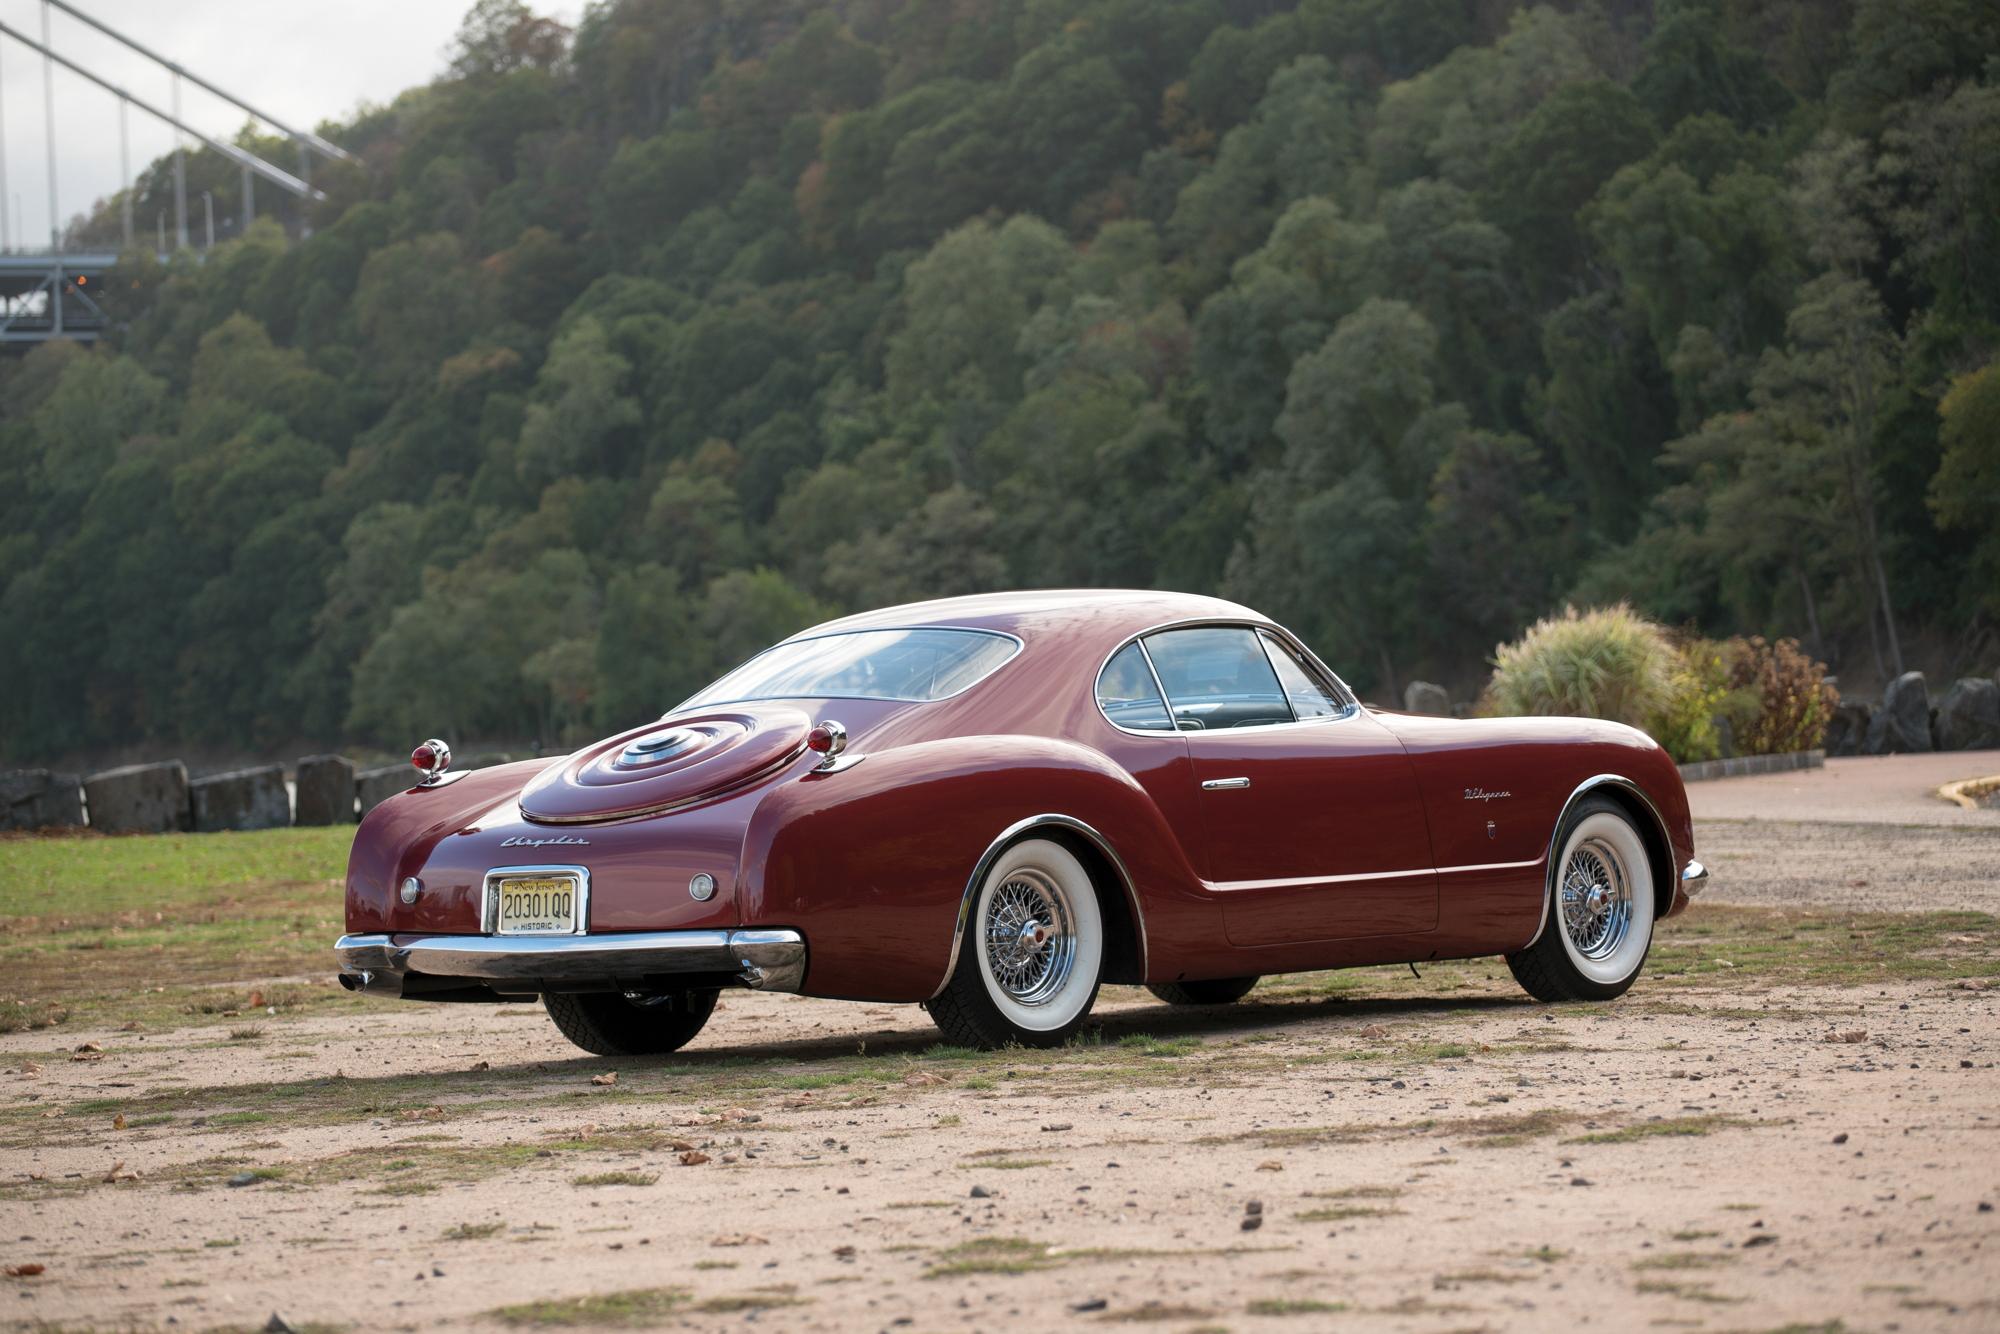 1952 Chrysler D'Elegance by Ghia rear